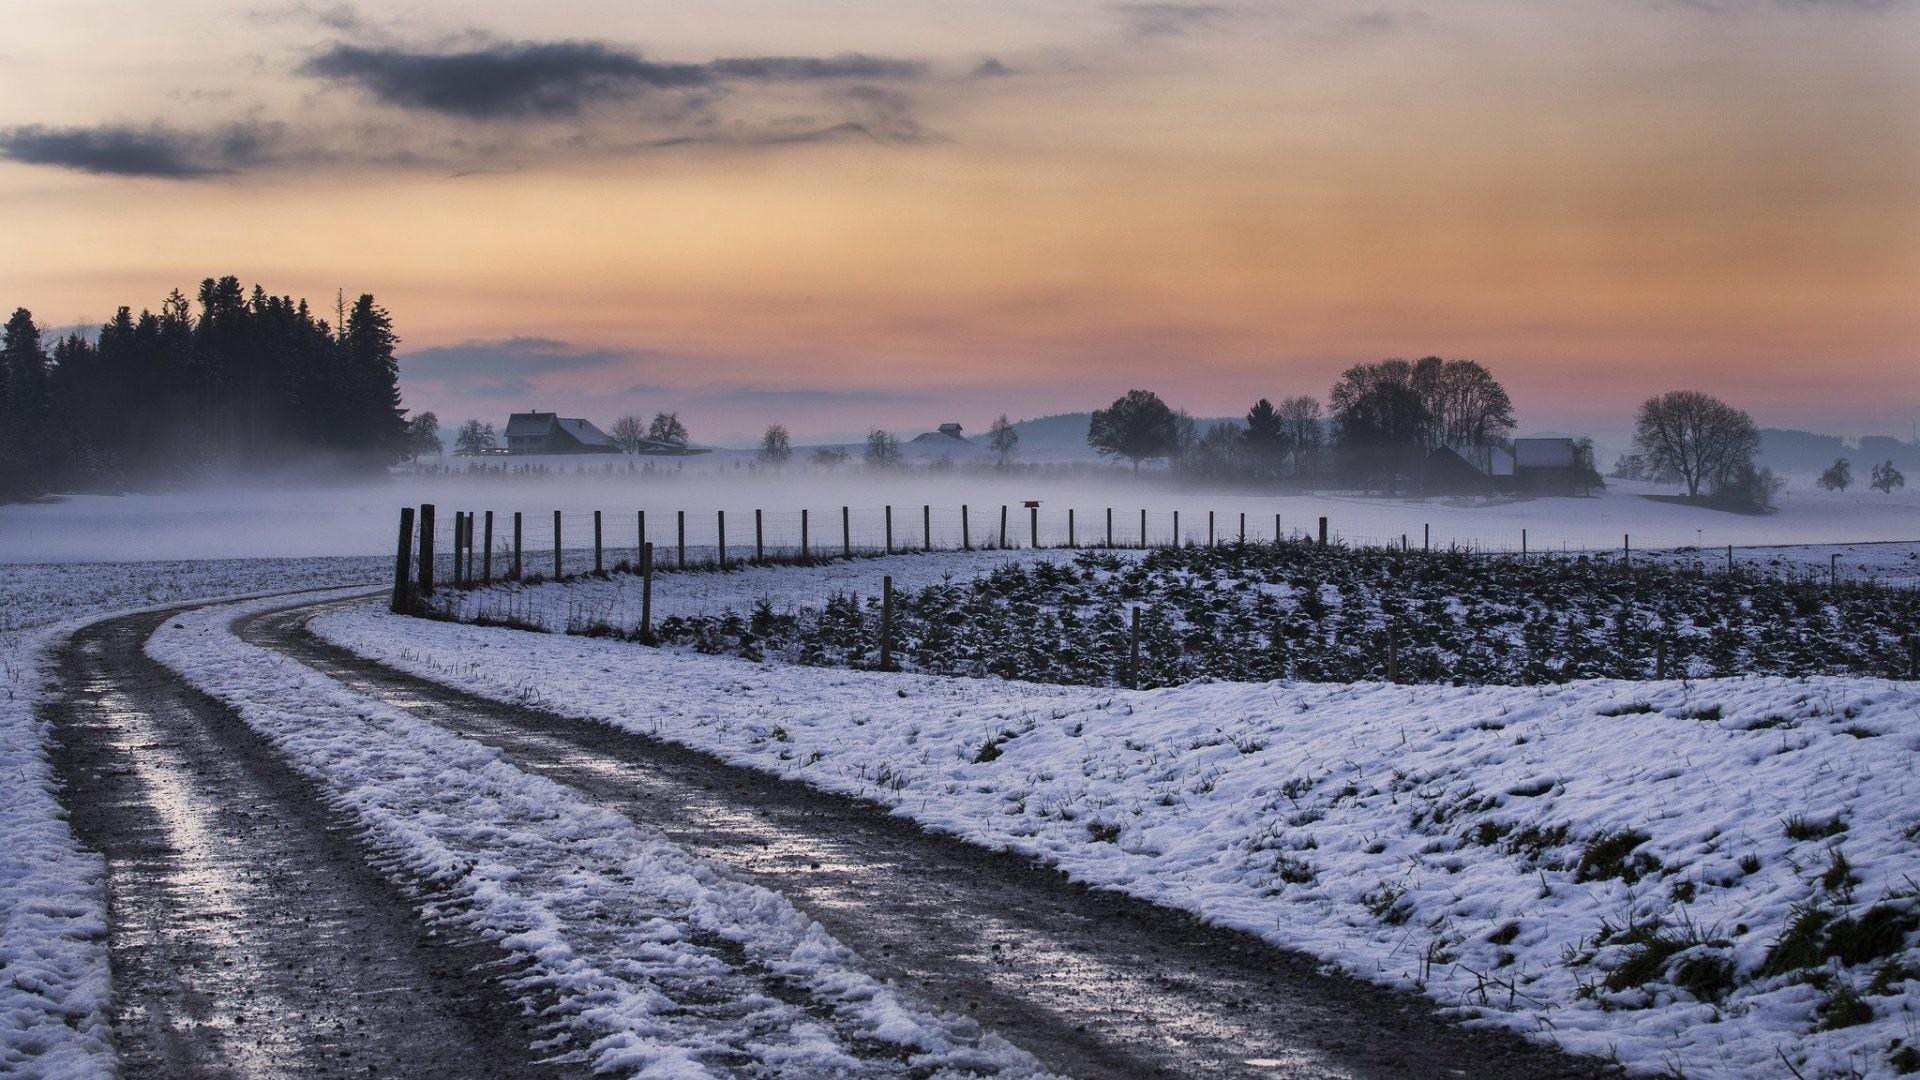 Frozen Tag – Frozen Snow Mountain Nature Landscapes Winter Pictures For  Computer Desktop for HD 16